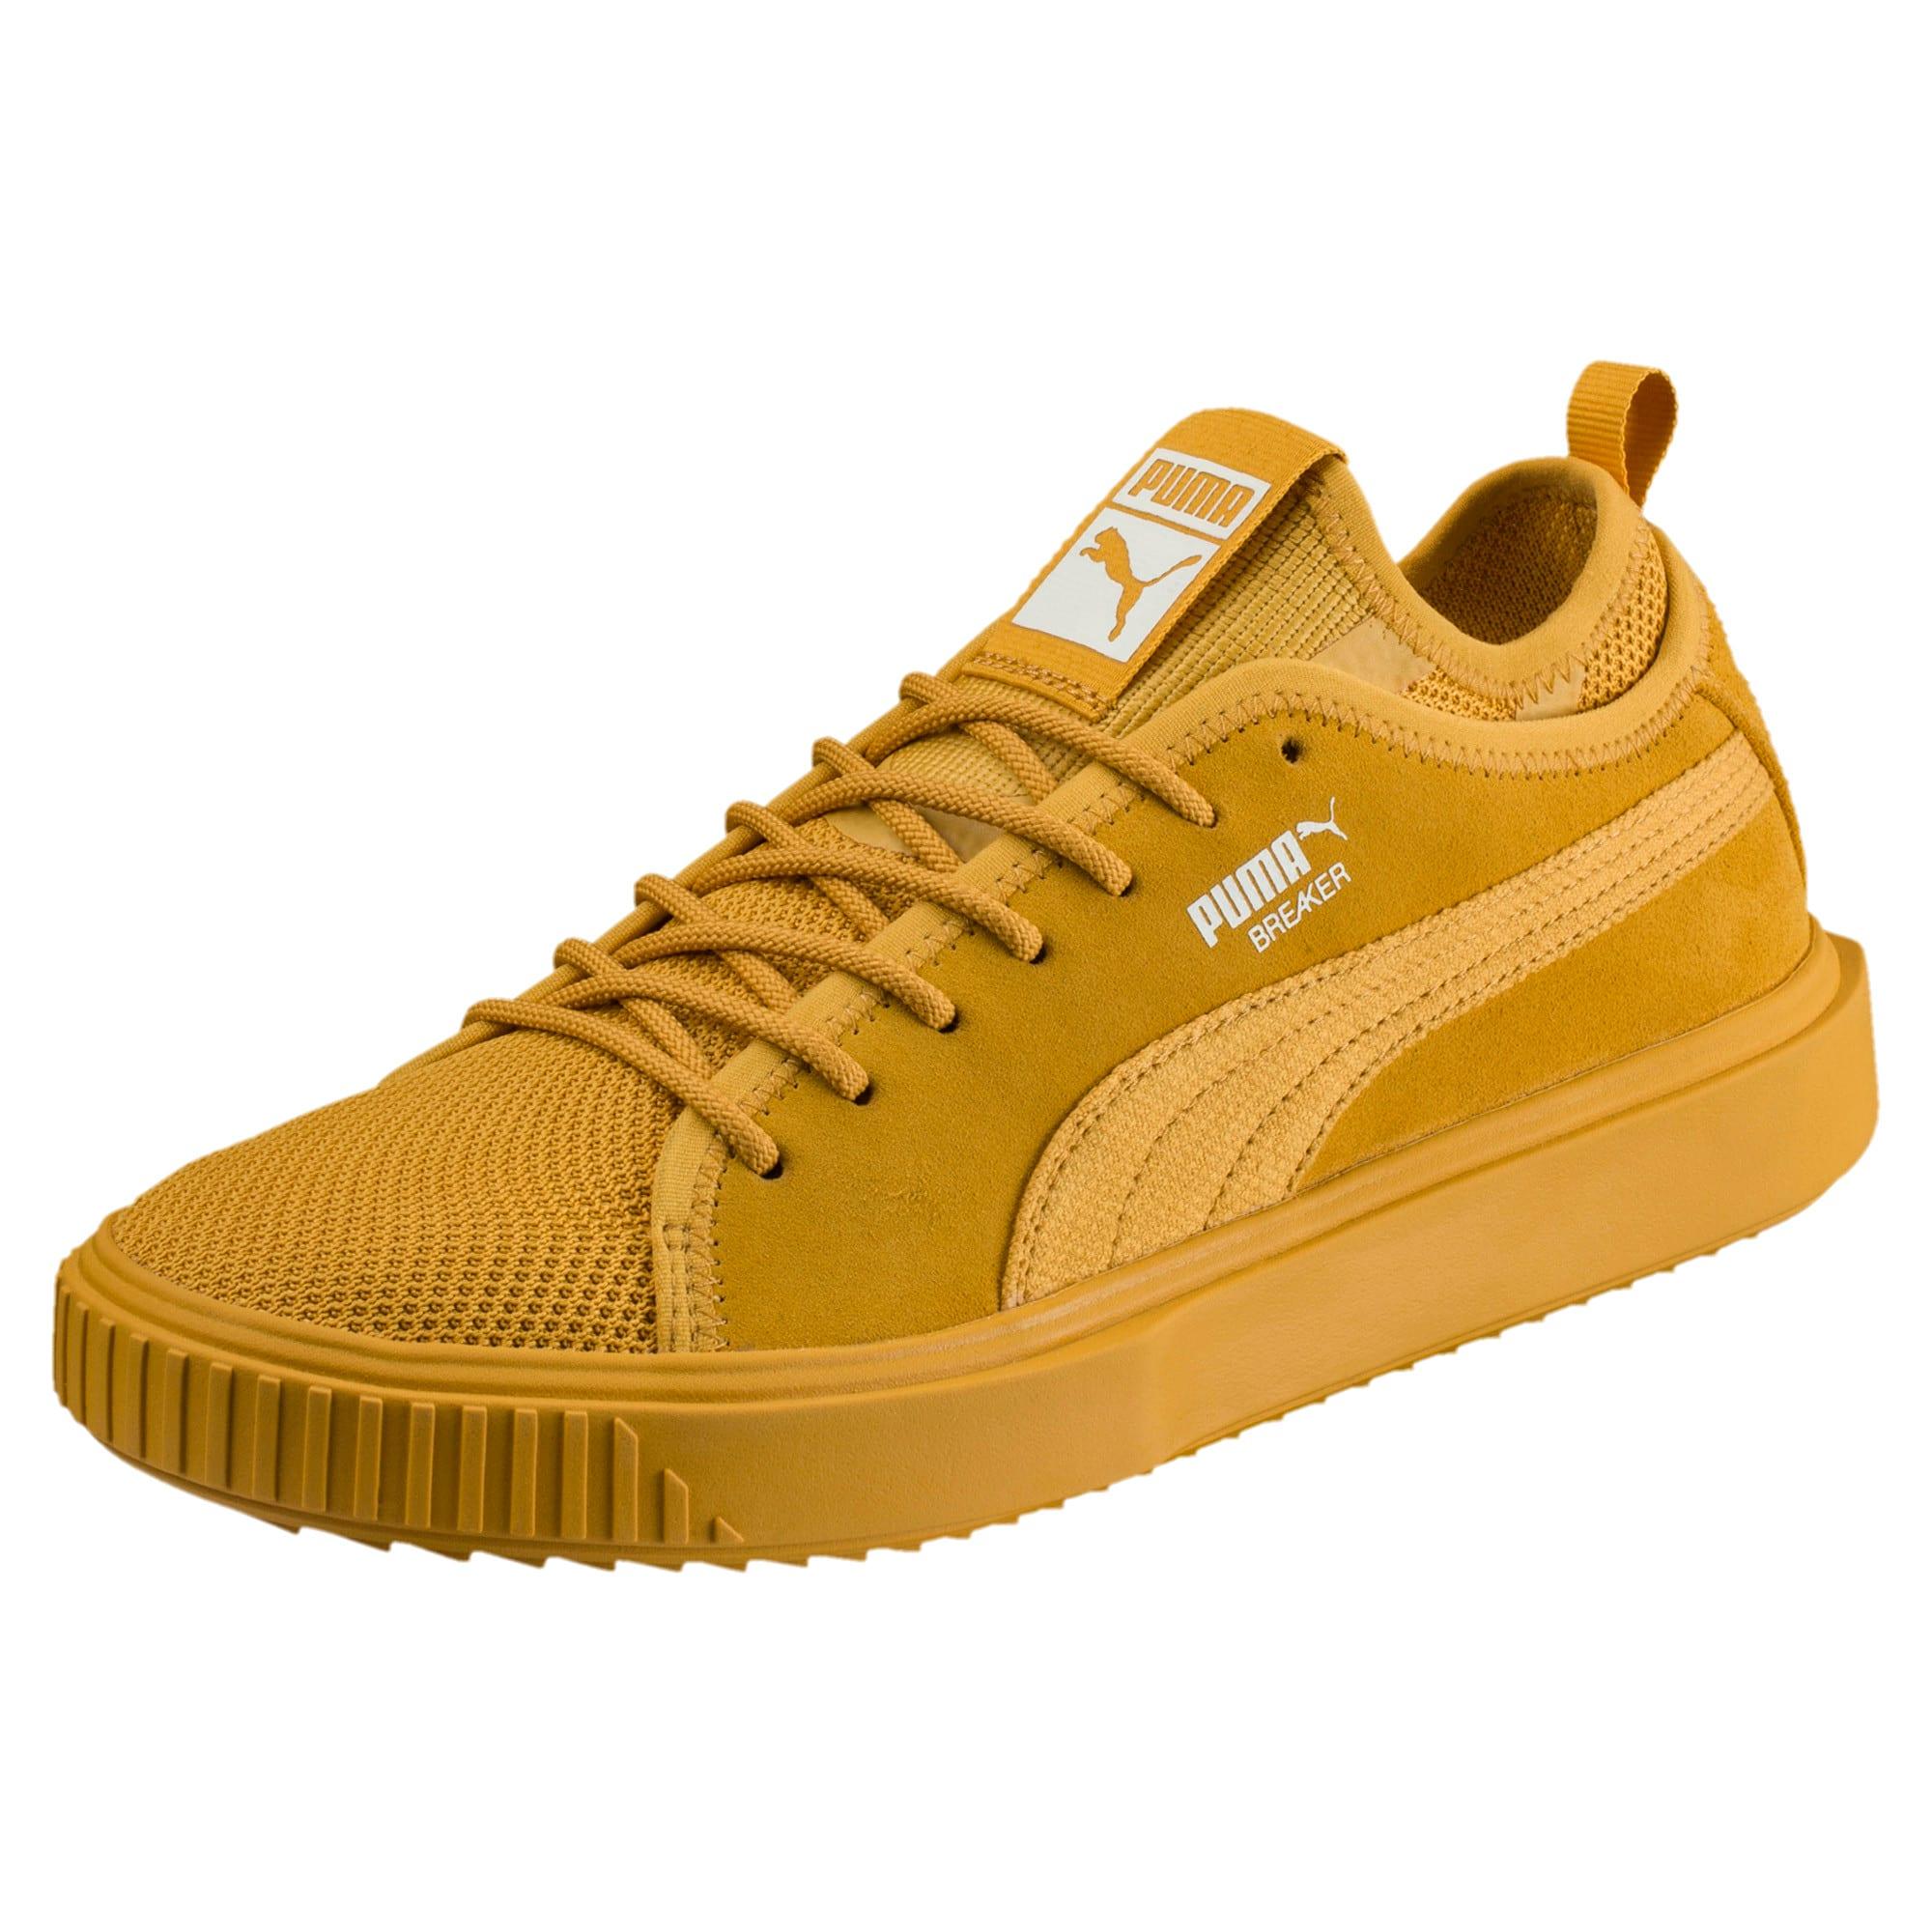 Thumbnail 1 of Breaker Mesh Men's Sneakers, Mineral Yellow-Minl Yellow, medium